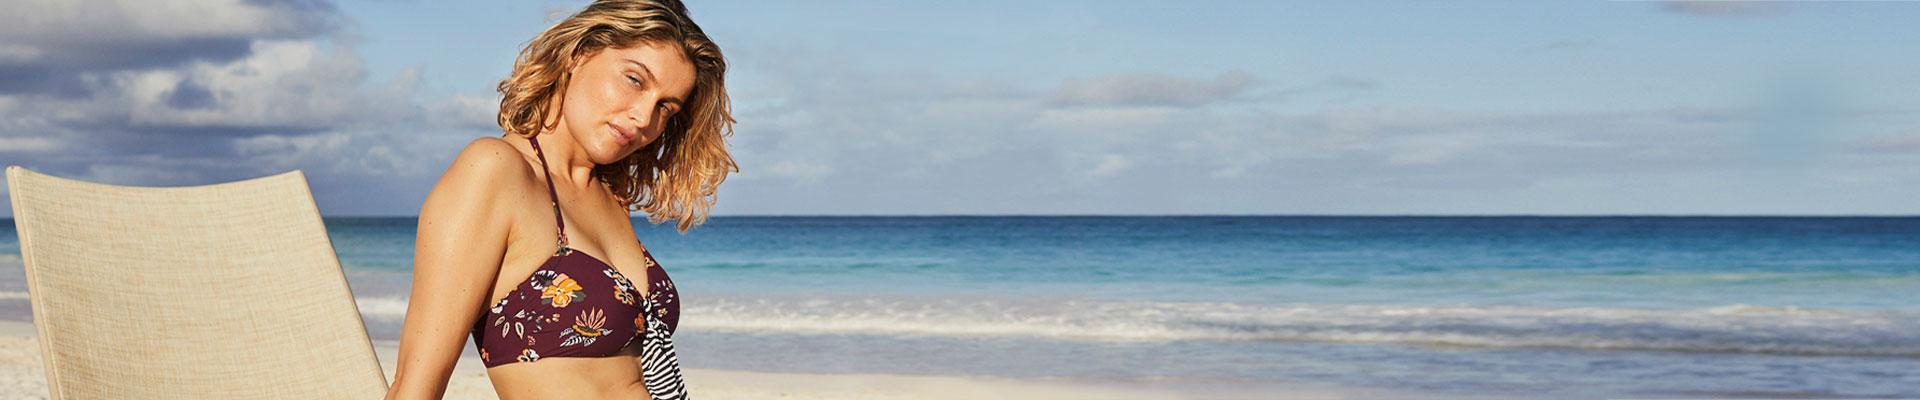 Plażowy must have według Leatitia Casta